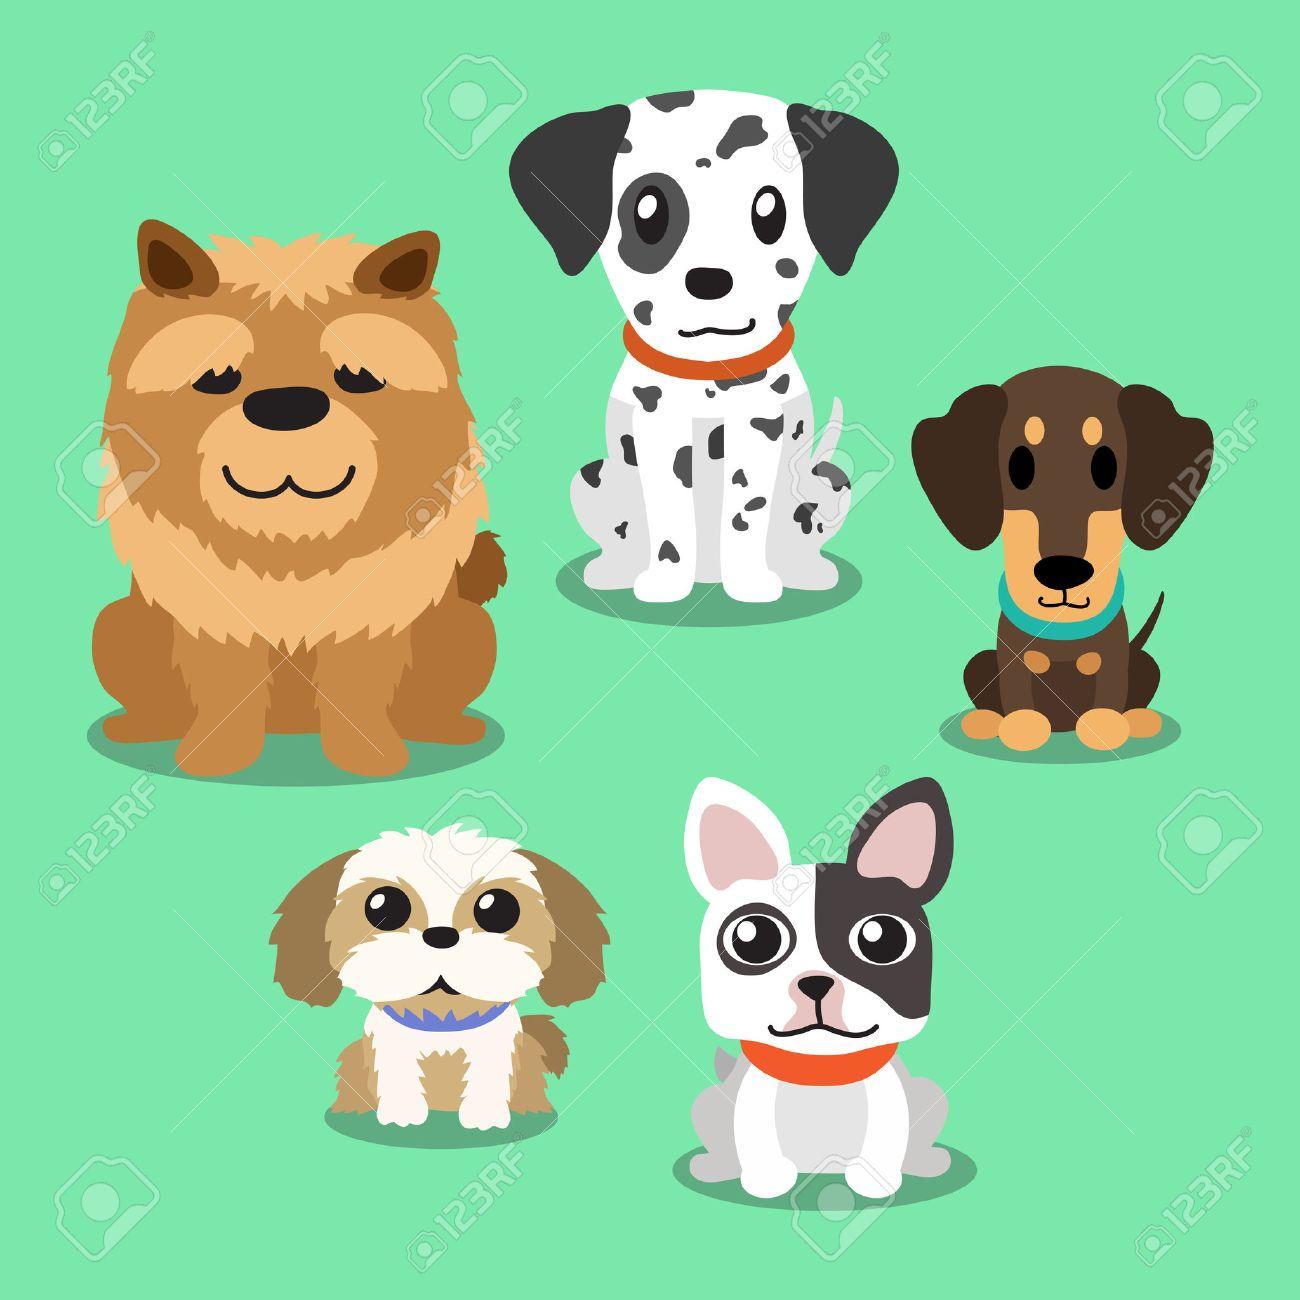 Cartoon dogs standing - 48211276